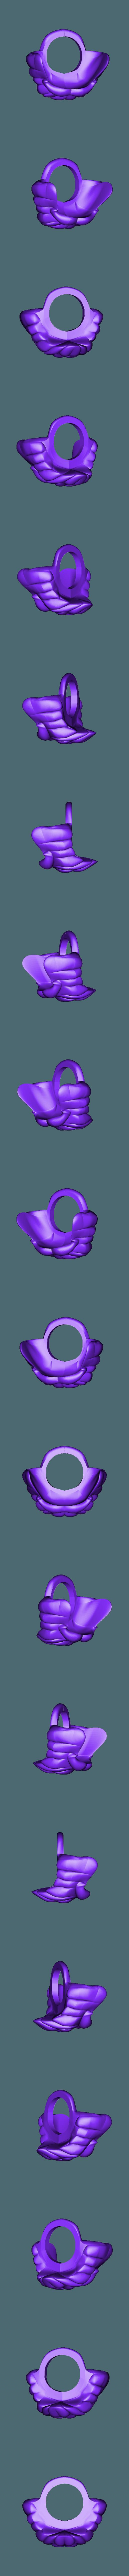 splinebeard_v03_102_percent.STL Download free STL file Jumbo Christmas - Santa Claus • 3D printer template, HowardB